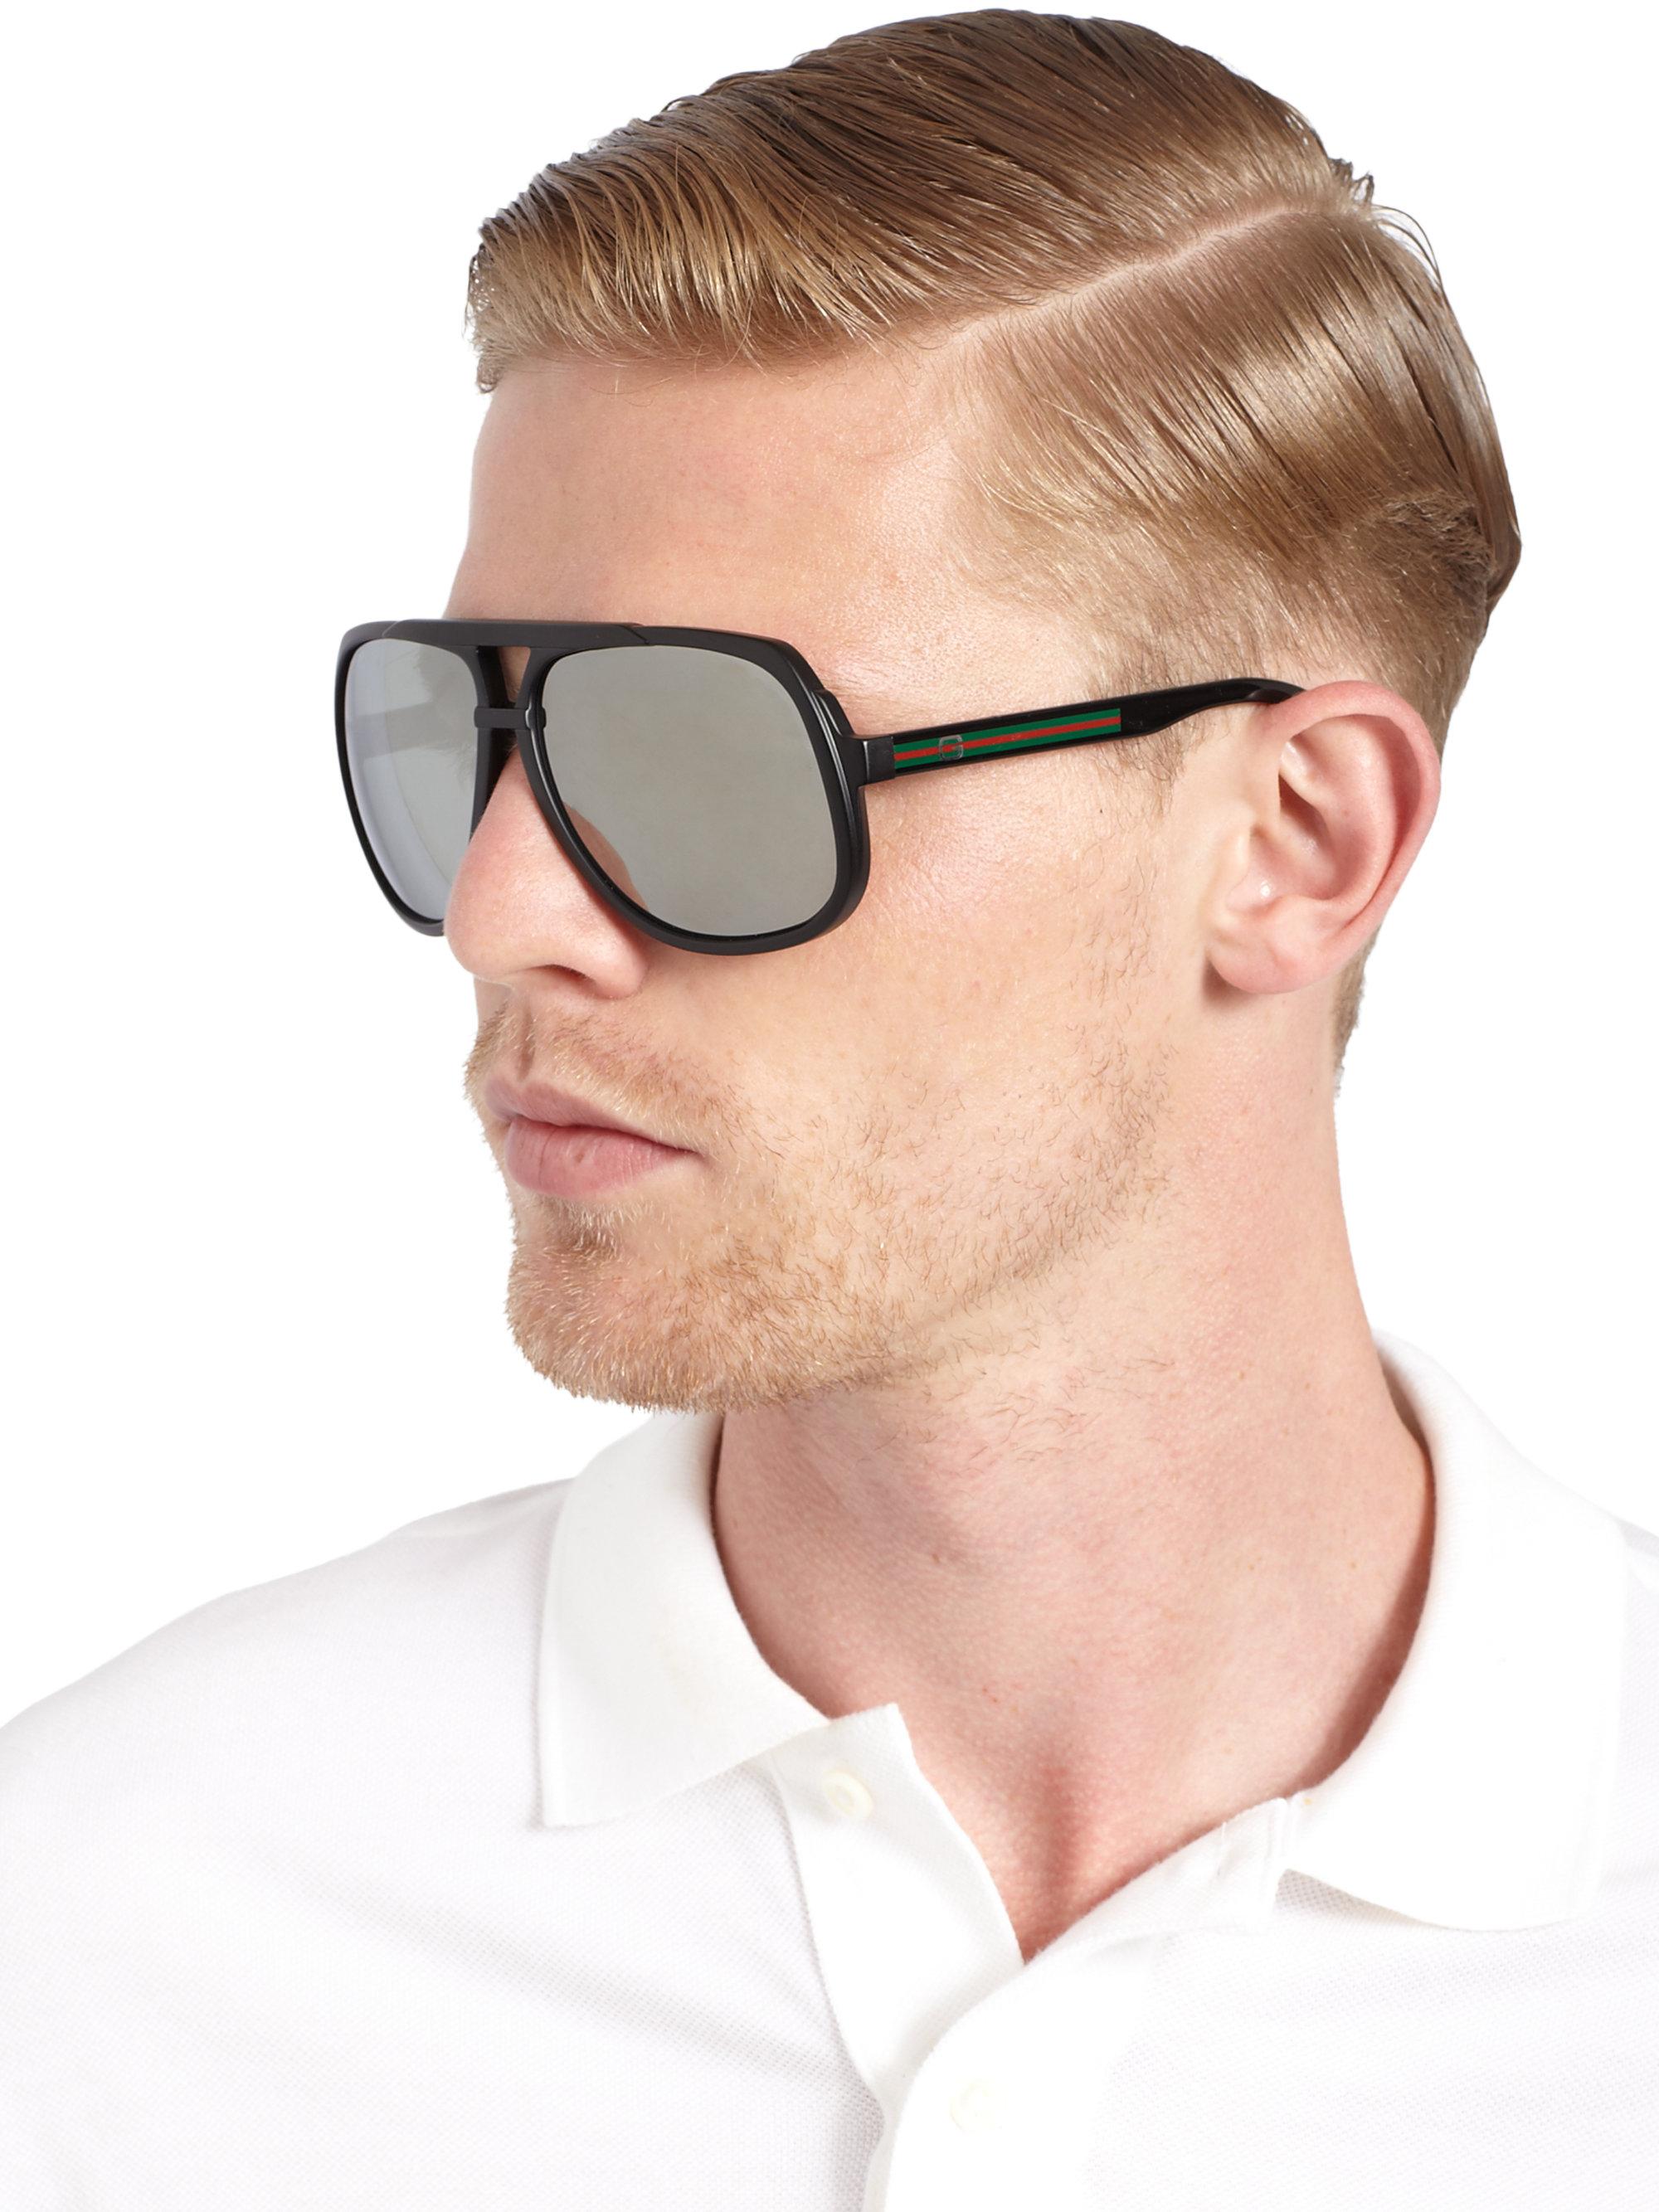 edf8ad4929 Lyst - Gucci Acetate Navigator Sunglasses in Black for Men